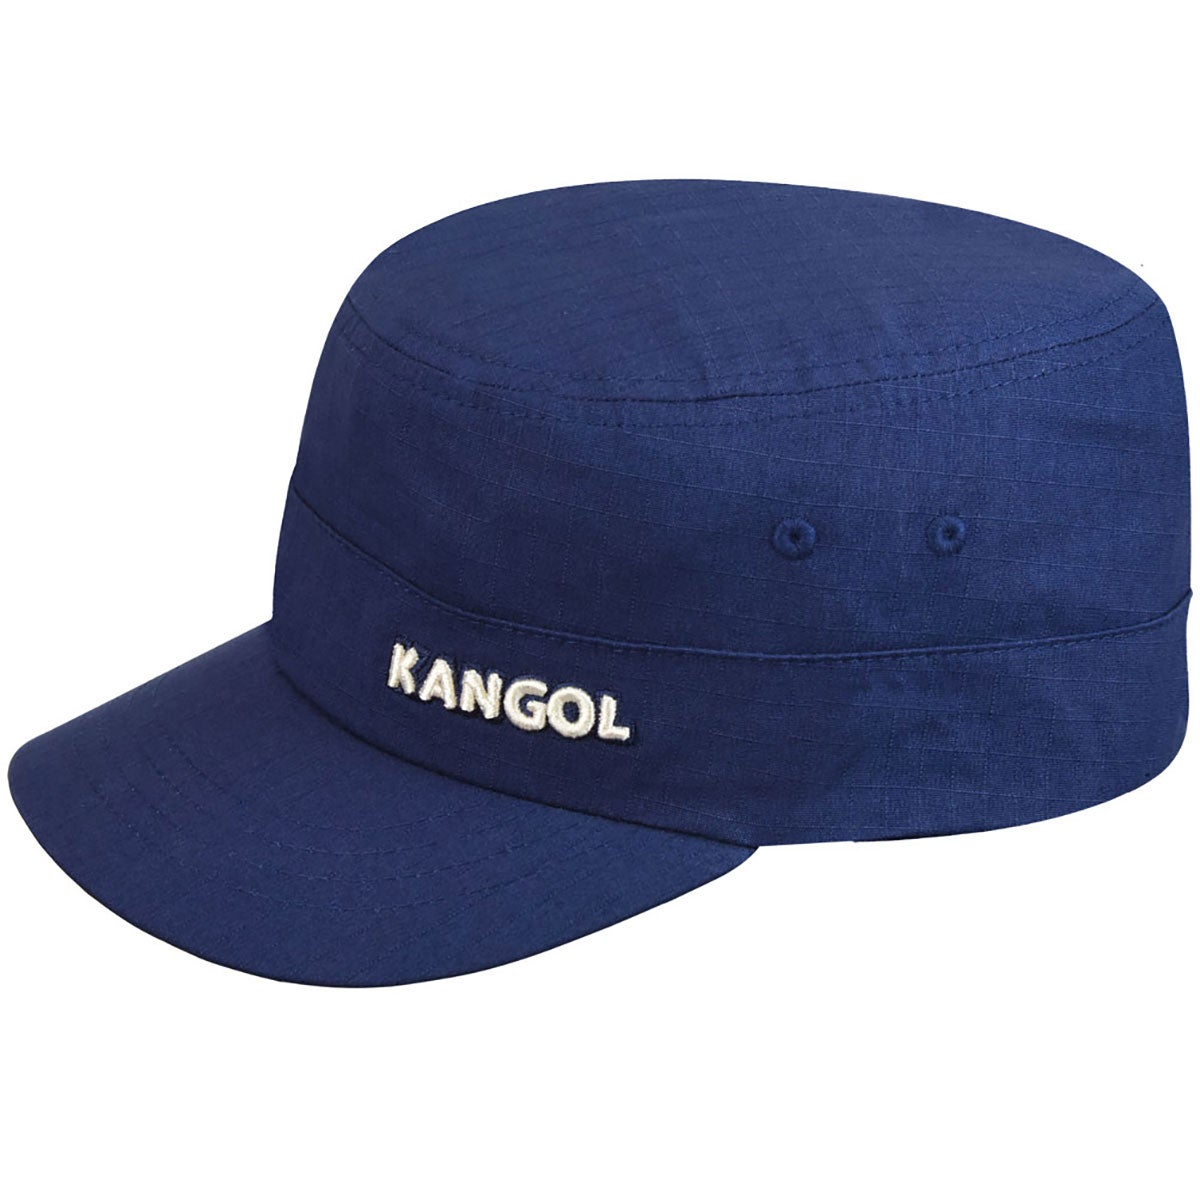 Kangol Ripstop Army Cap in Navy